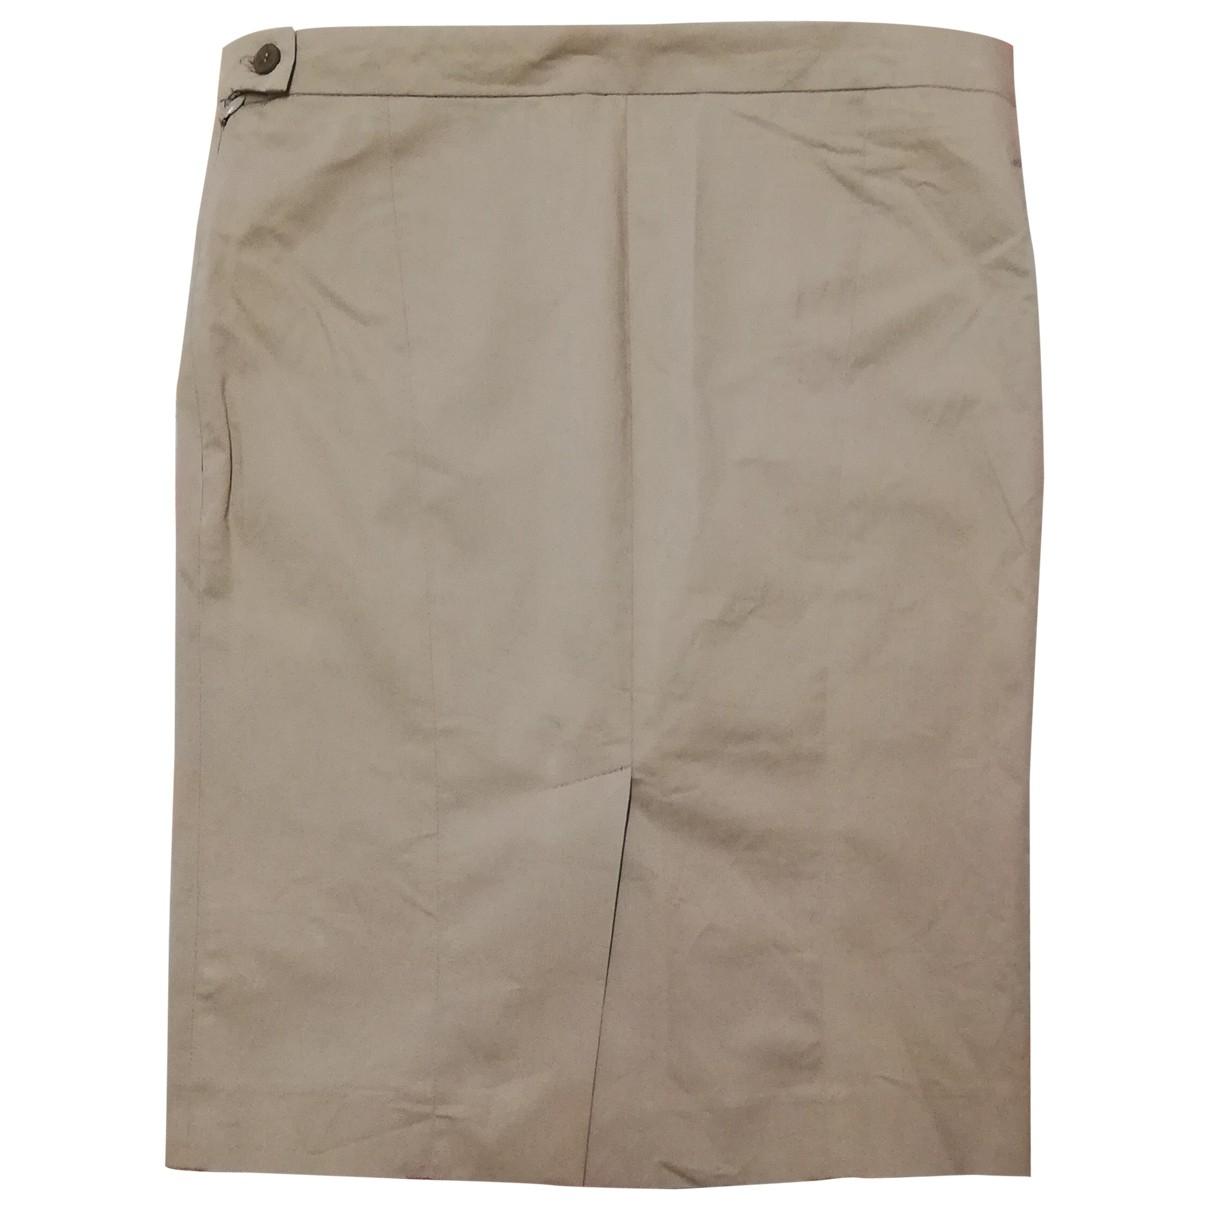 Patrizia Pepe \N Beige Cotton - elasthane skirt for Women 42 IT